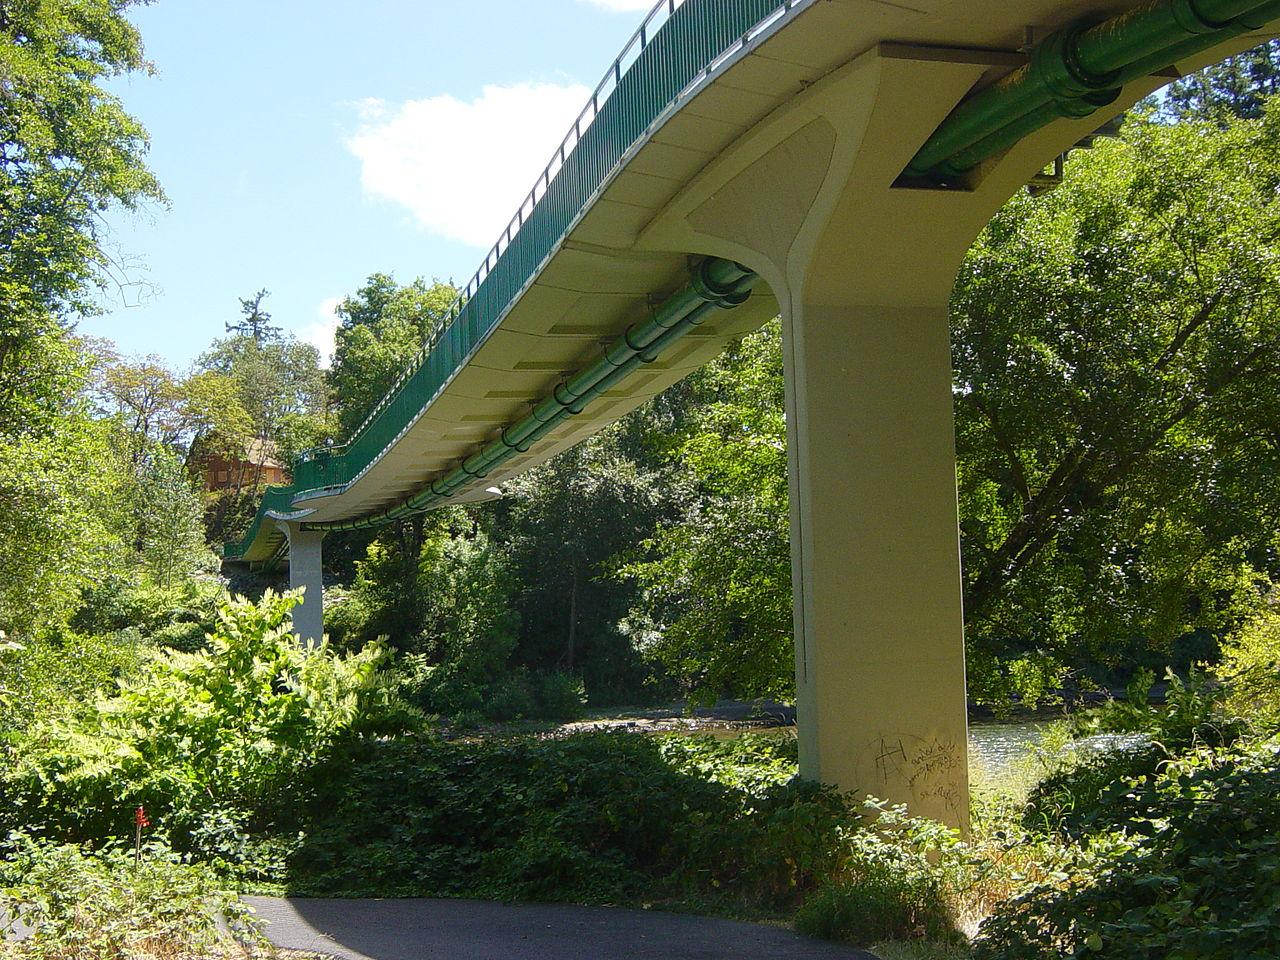 Puente peatonal pretensado, Grants Pass, Oregon, USA.